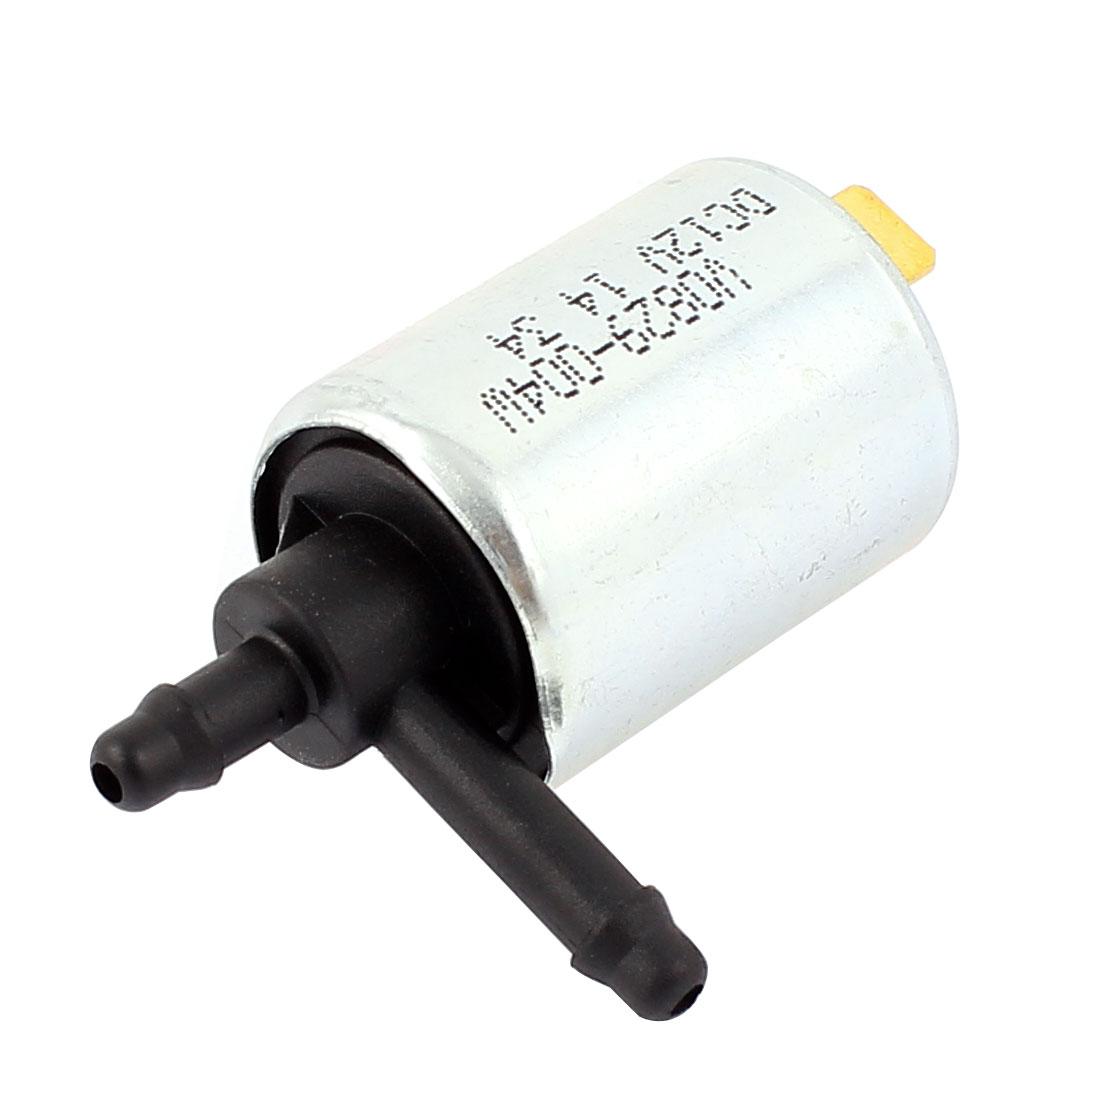 Silver Tone Water Valve Solenoid Electromagnet DC 12V 0.4-0.5kgf/cm2